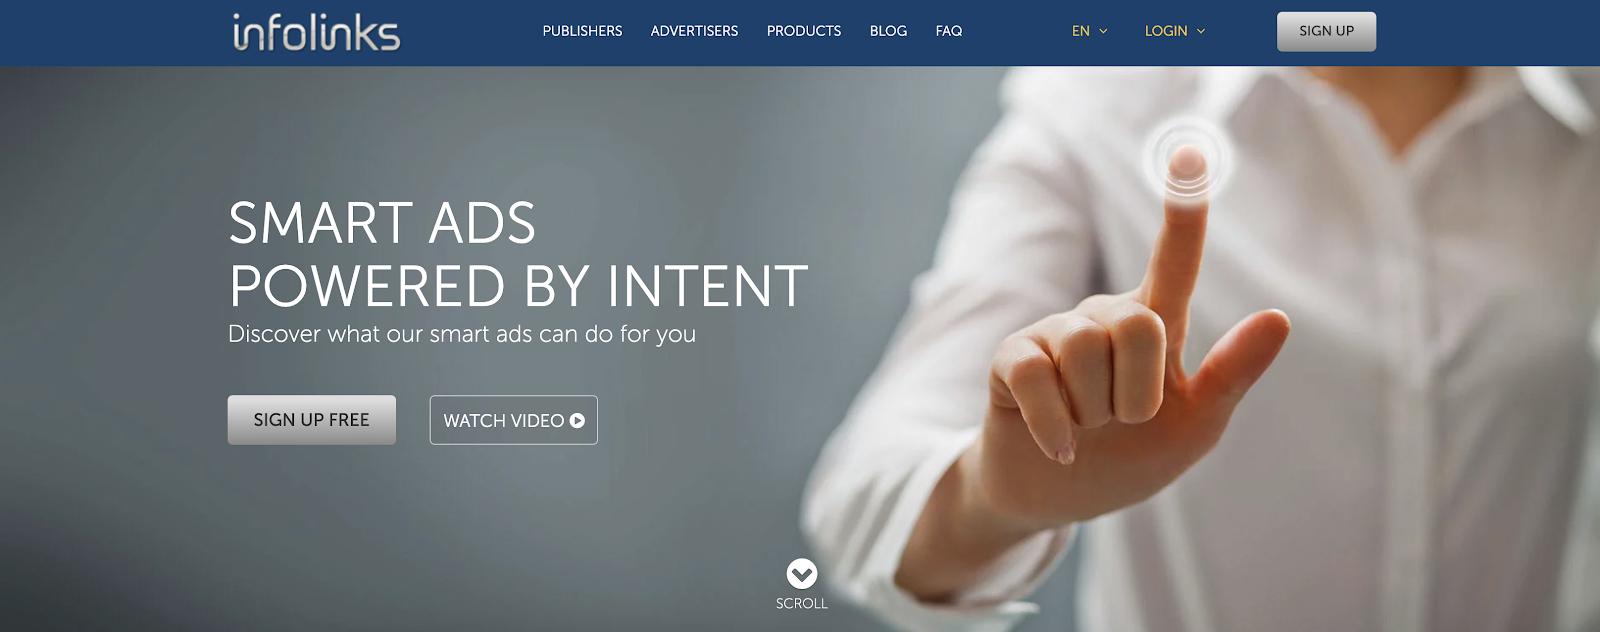 Infolinks Blog Advertising Network Homepage Screenshot